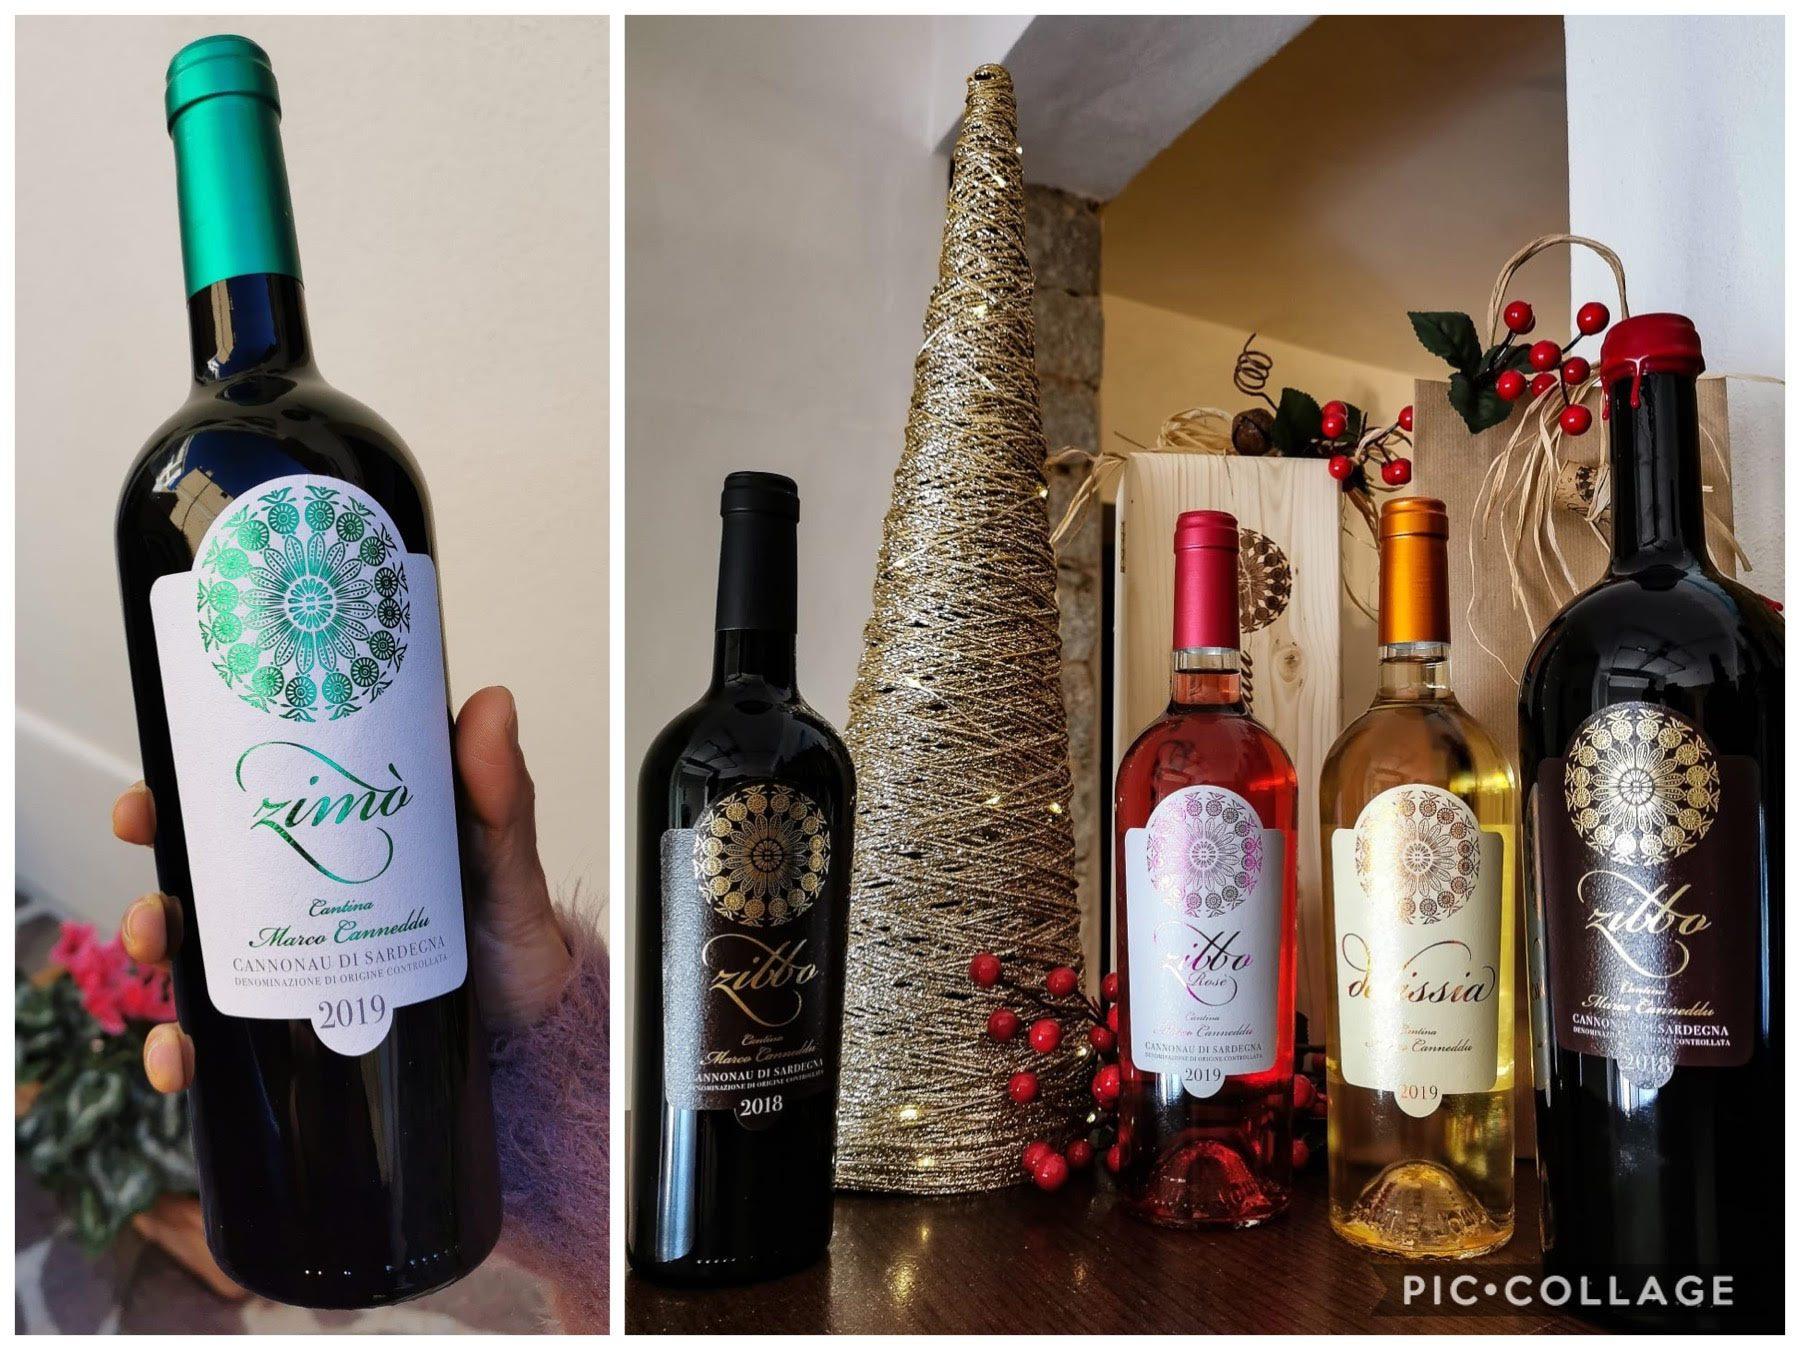 #cantinacanneddu #vini #cannonau #granazza #rosato #mamoiada #sardegna #territorio #terroir #wines #redwines #whitewine #winetasting #winelovers #wine&food #winemotions #wineteller #winestory #familywinery #italianwine #italy